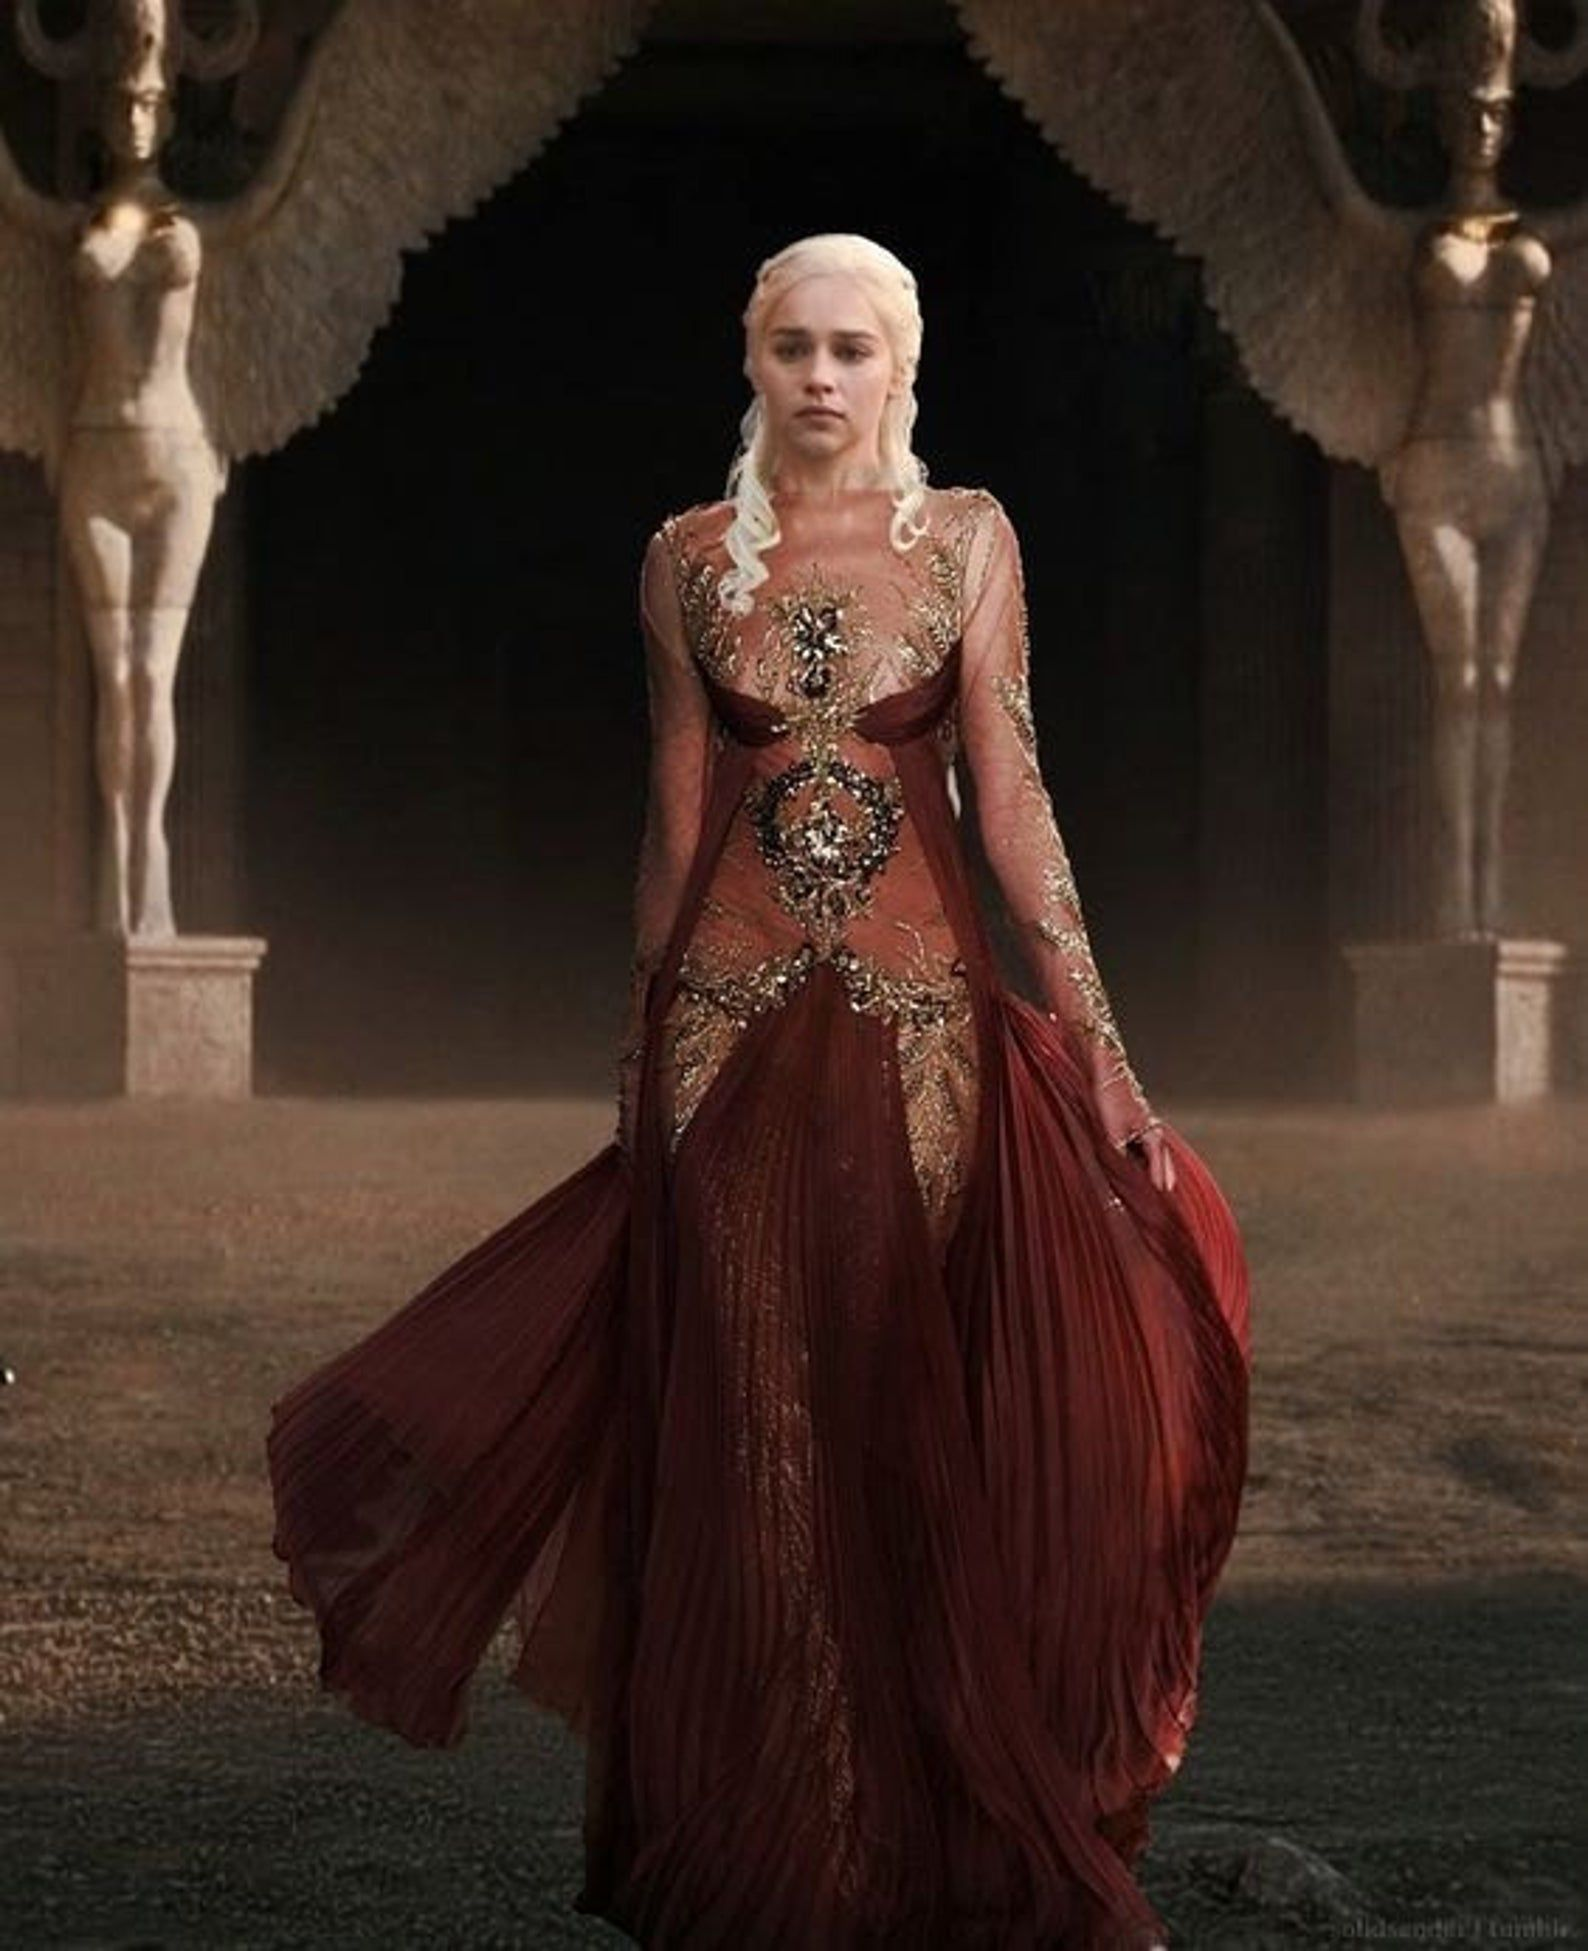 Got game of thrones Daenerys replica dress Mother